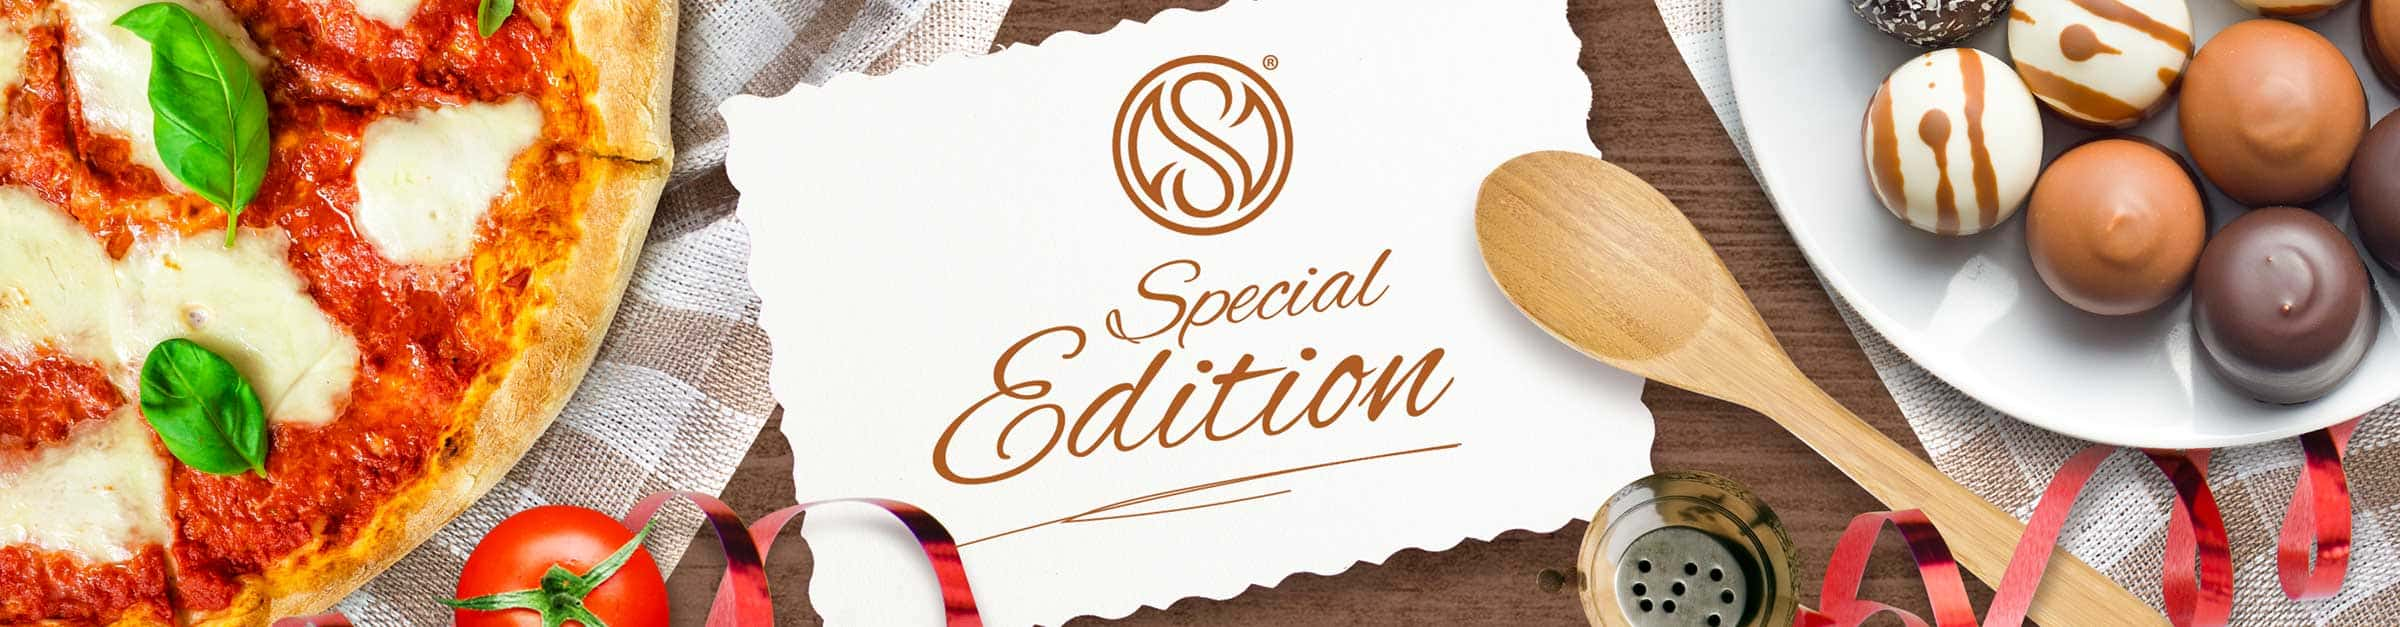 Special Edition - Simon Italian Food